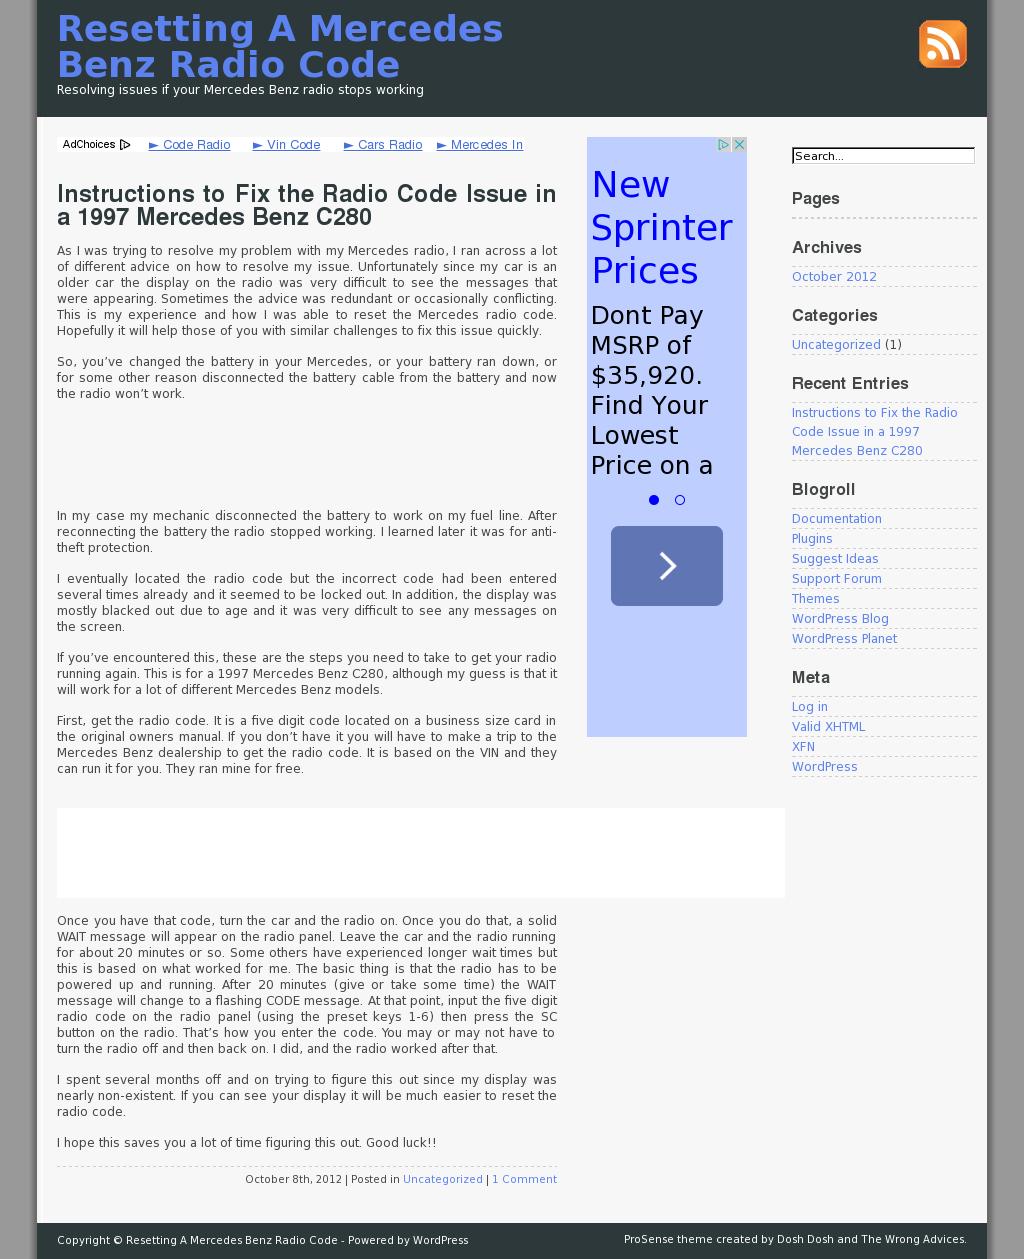 Resetting A Mercedes Benz Radio Code Competitors, Revenue